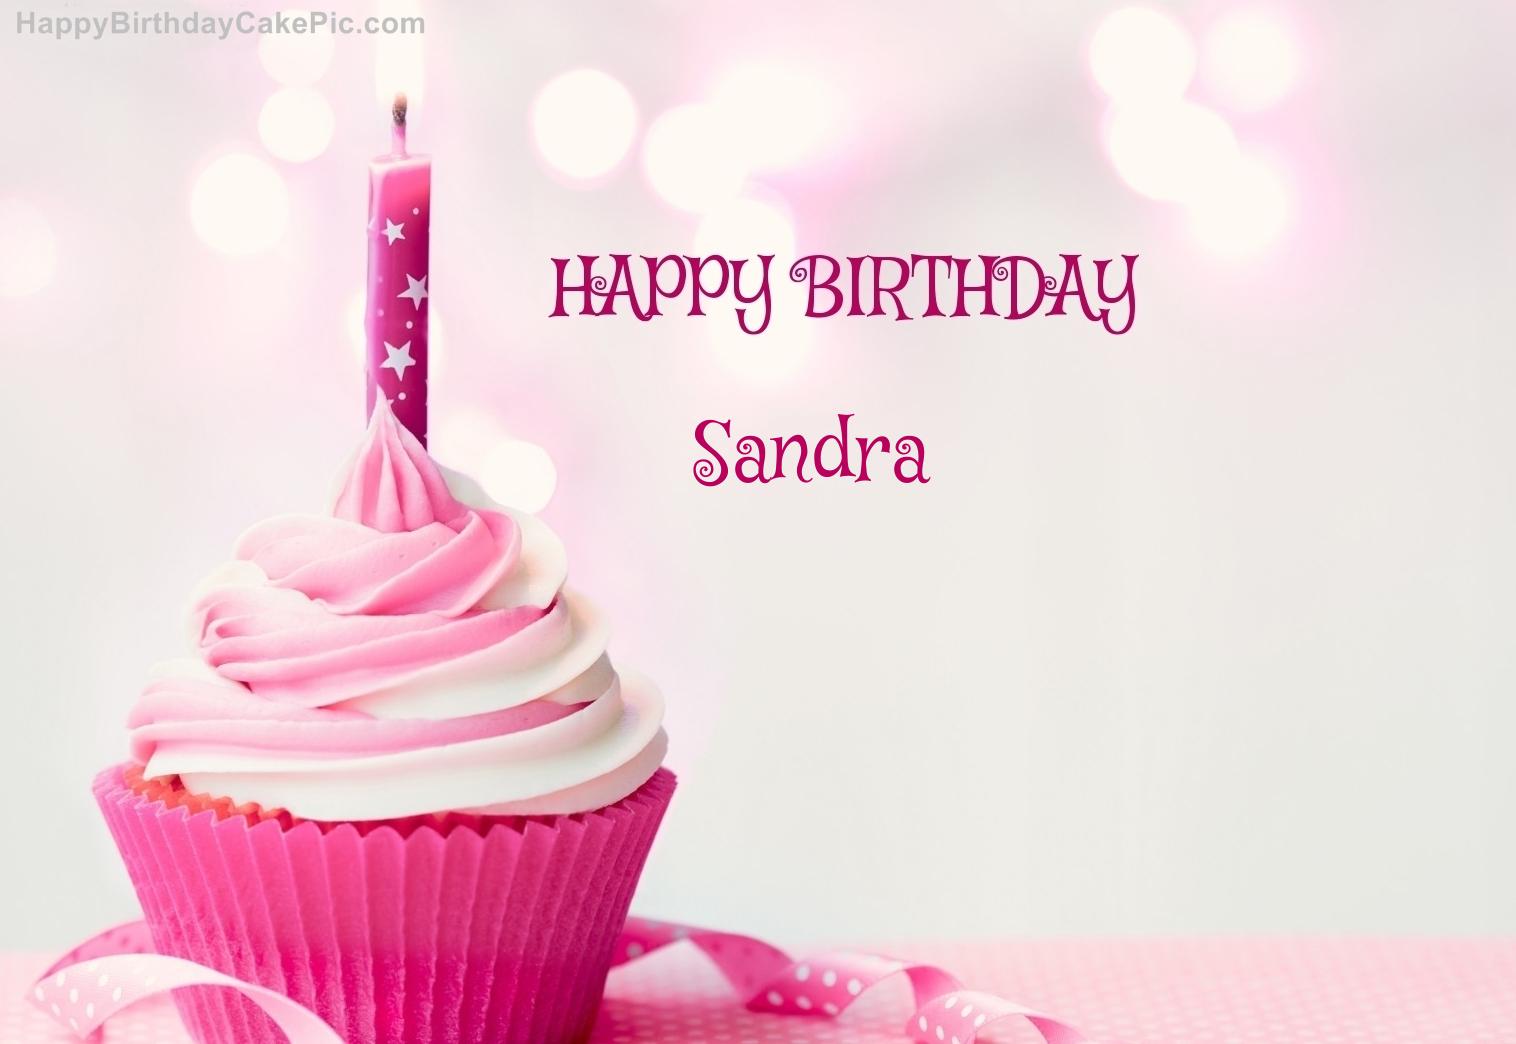 Happy Birthday Cupcake Candle Pink Cake For Sandra